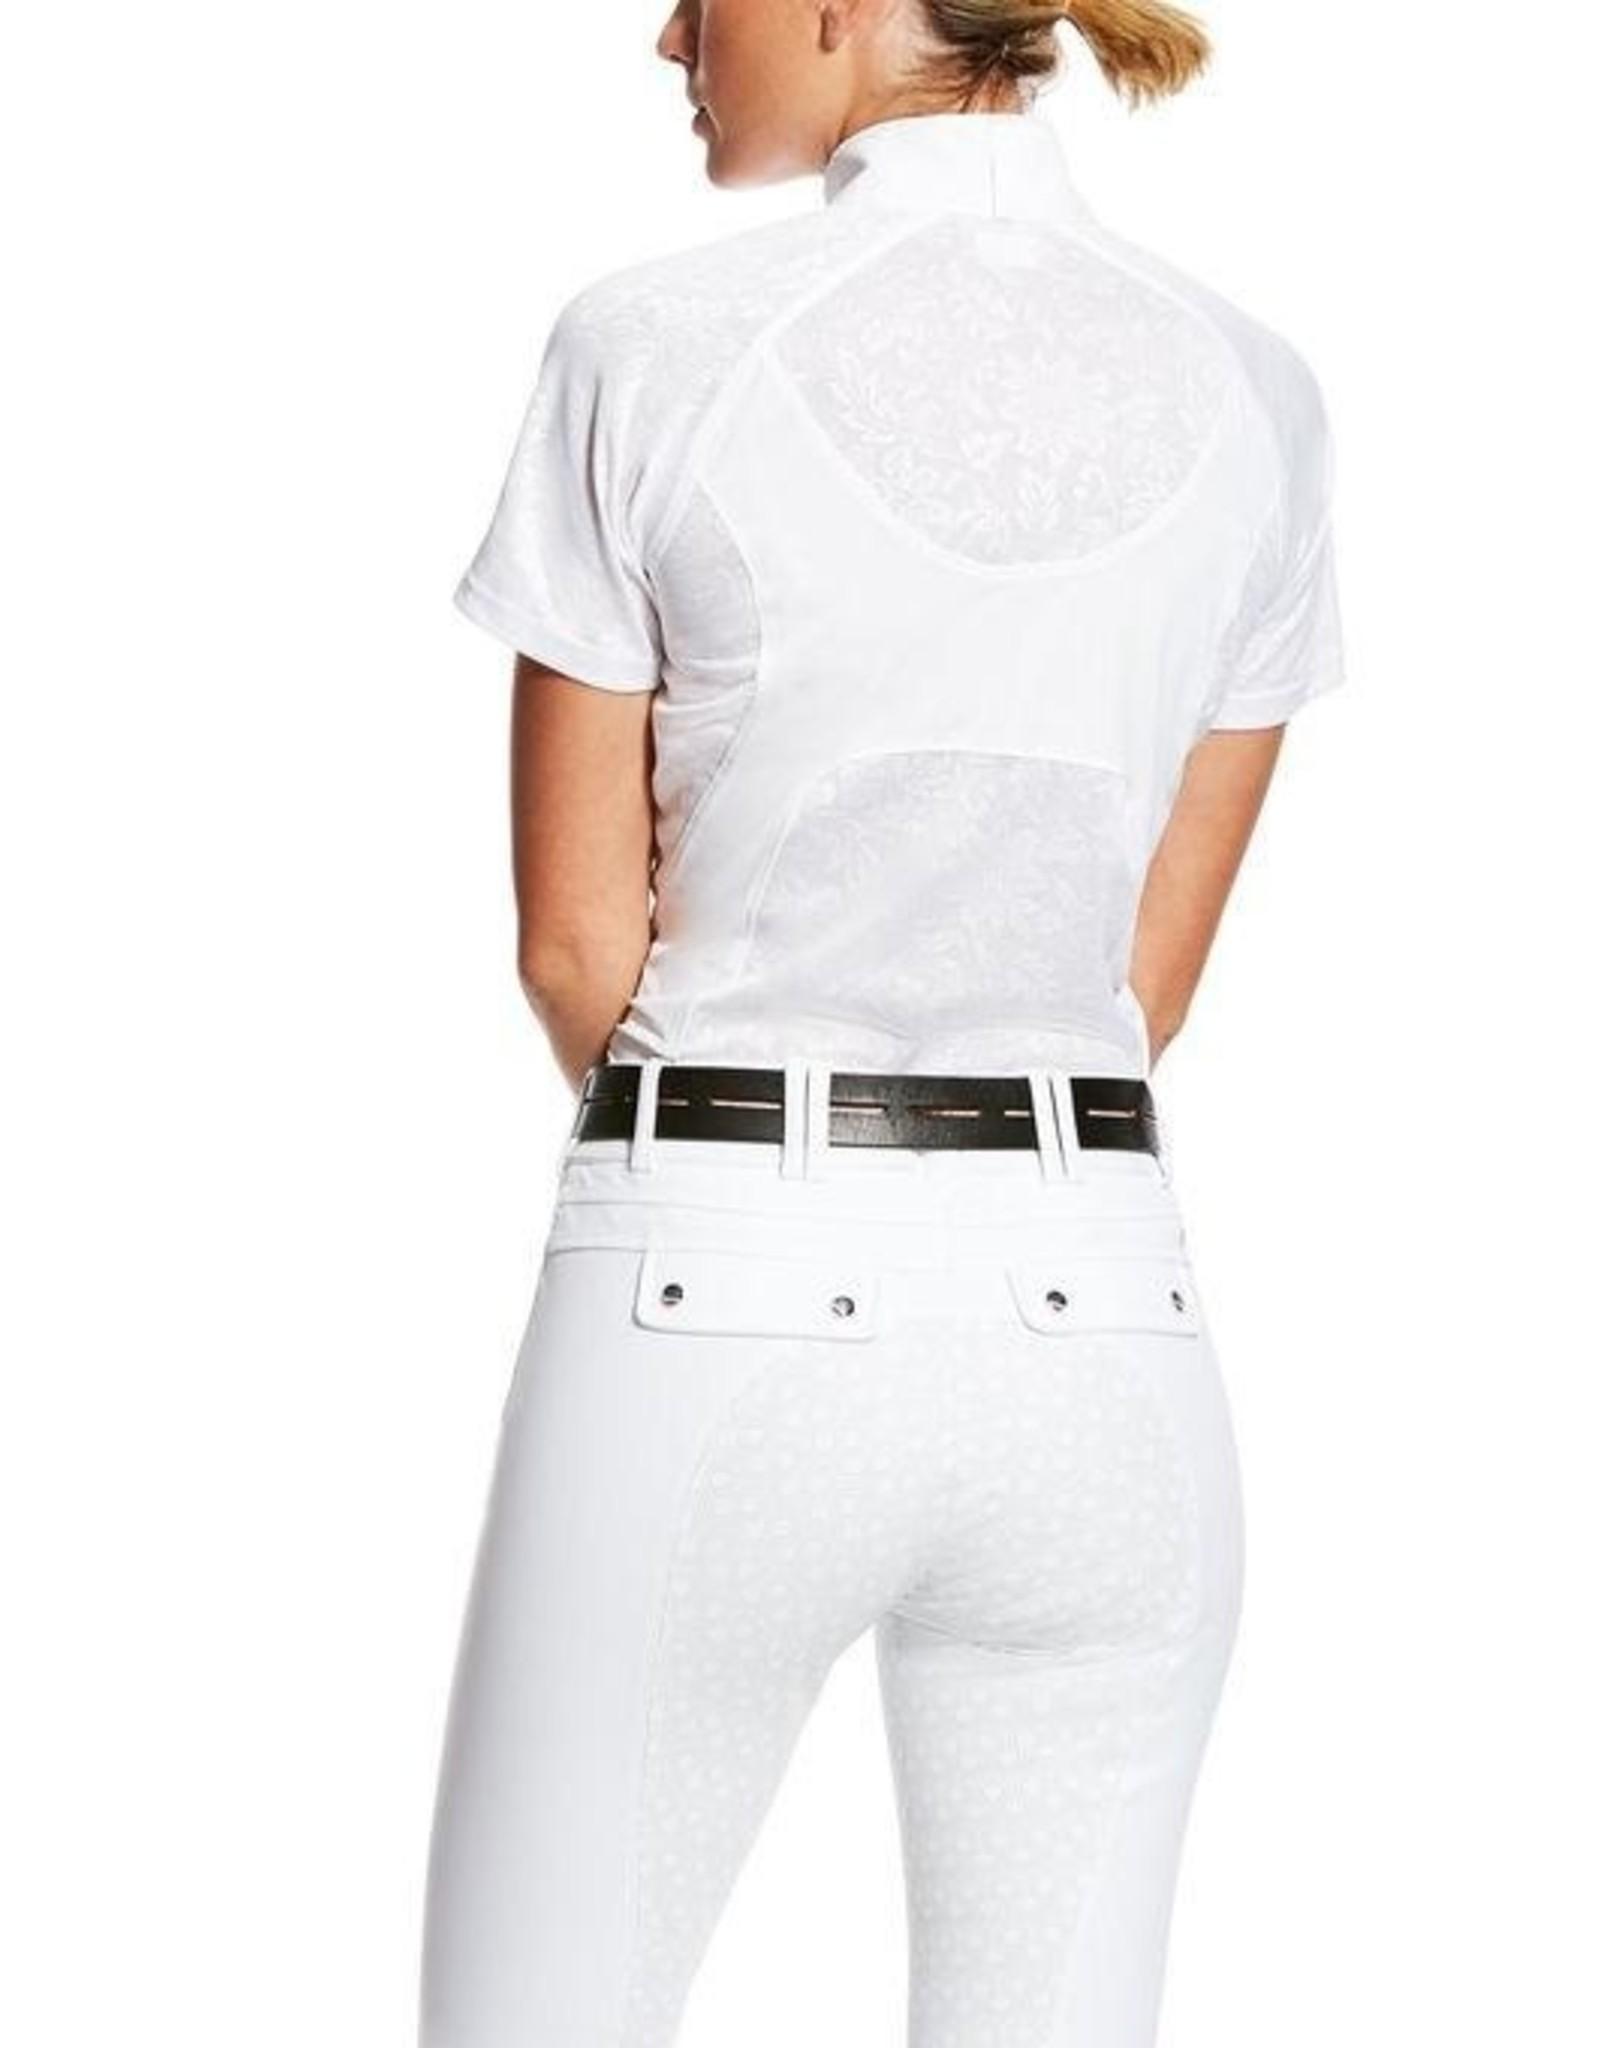 Ariat Marquis Short Sleeve Show Shirt